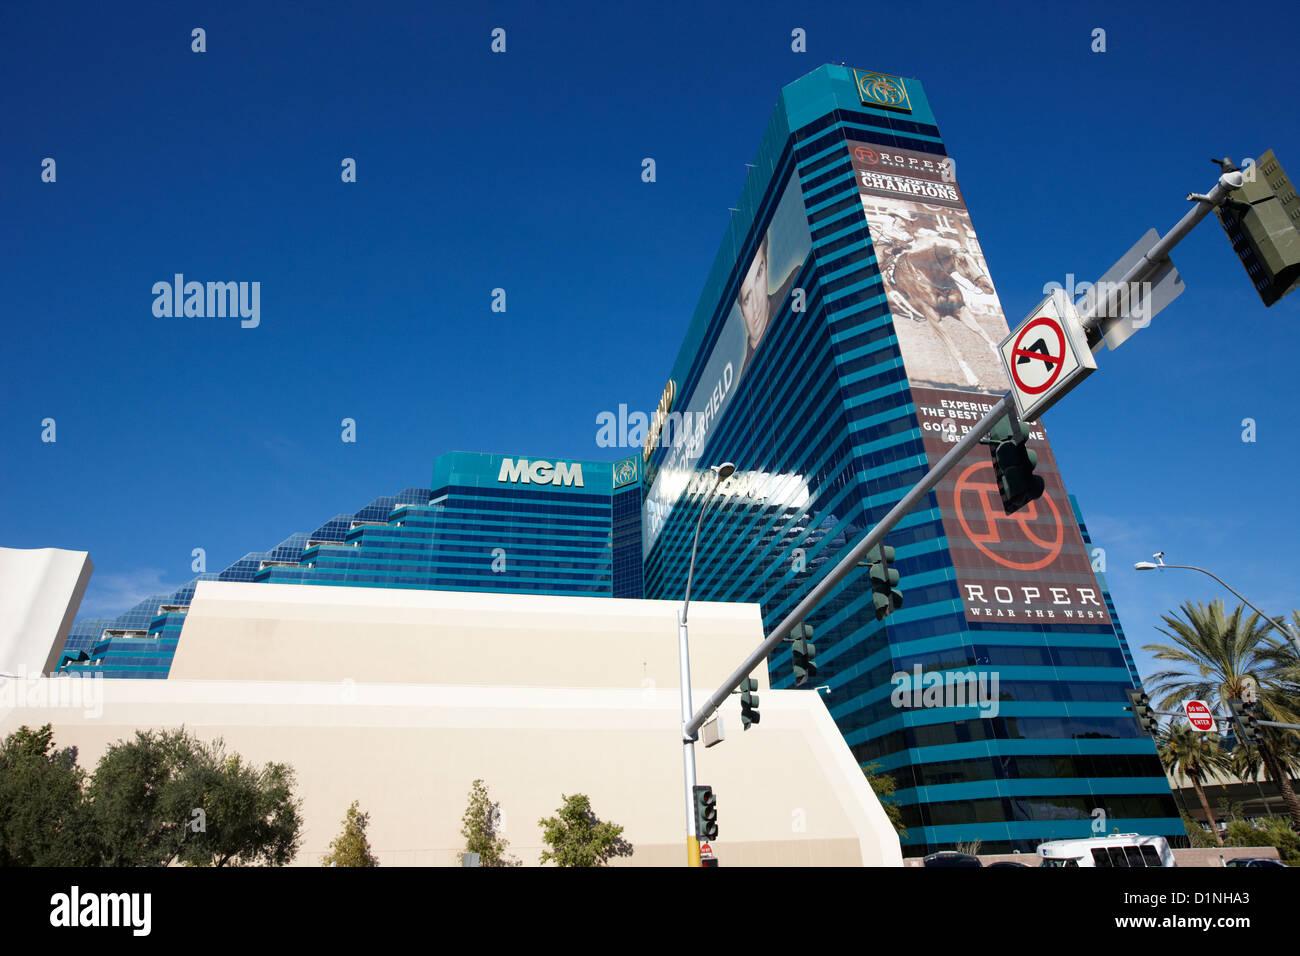 mgm grand resort and casino Las Vegas Nevada USA - Stock Image